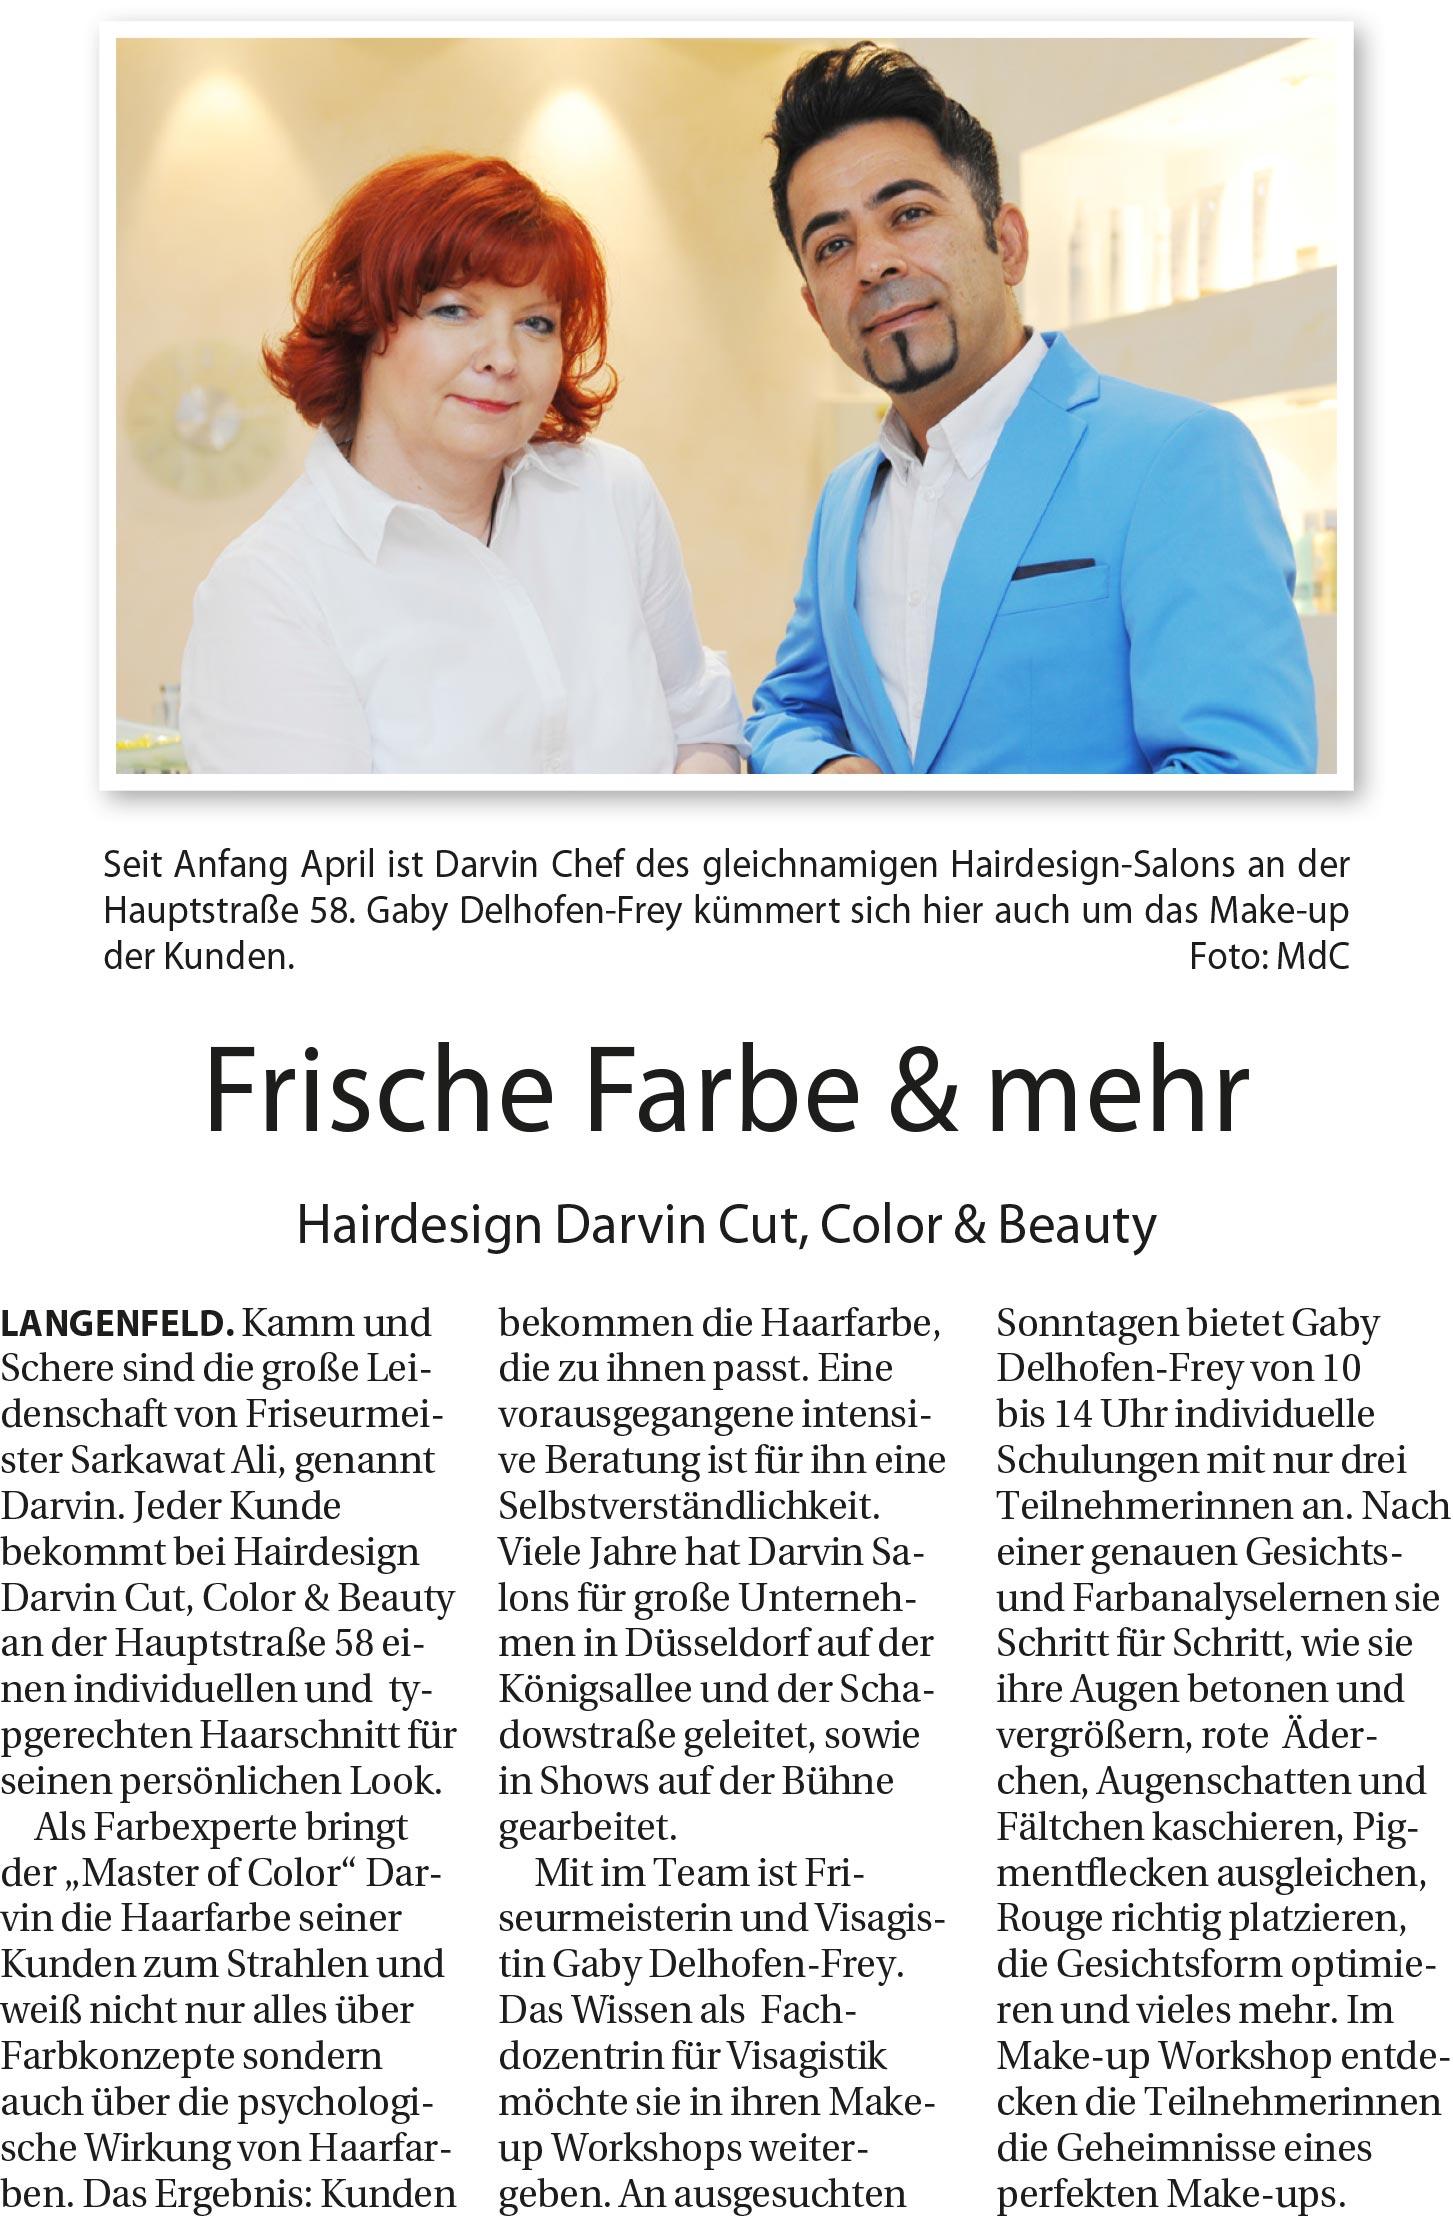 Presse-Langenfeld